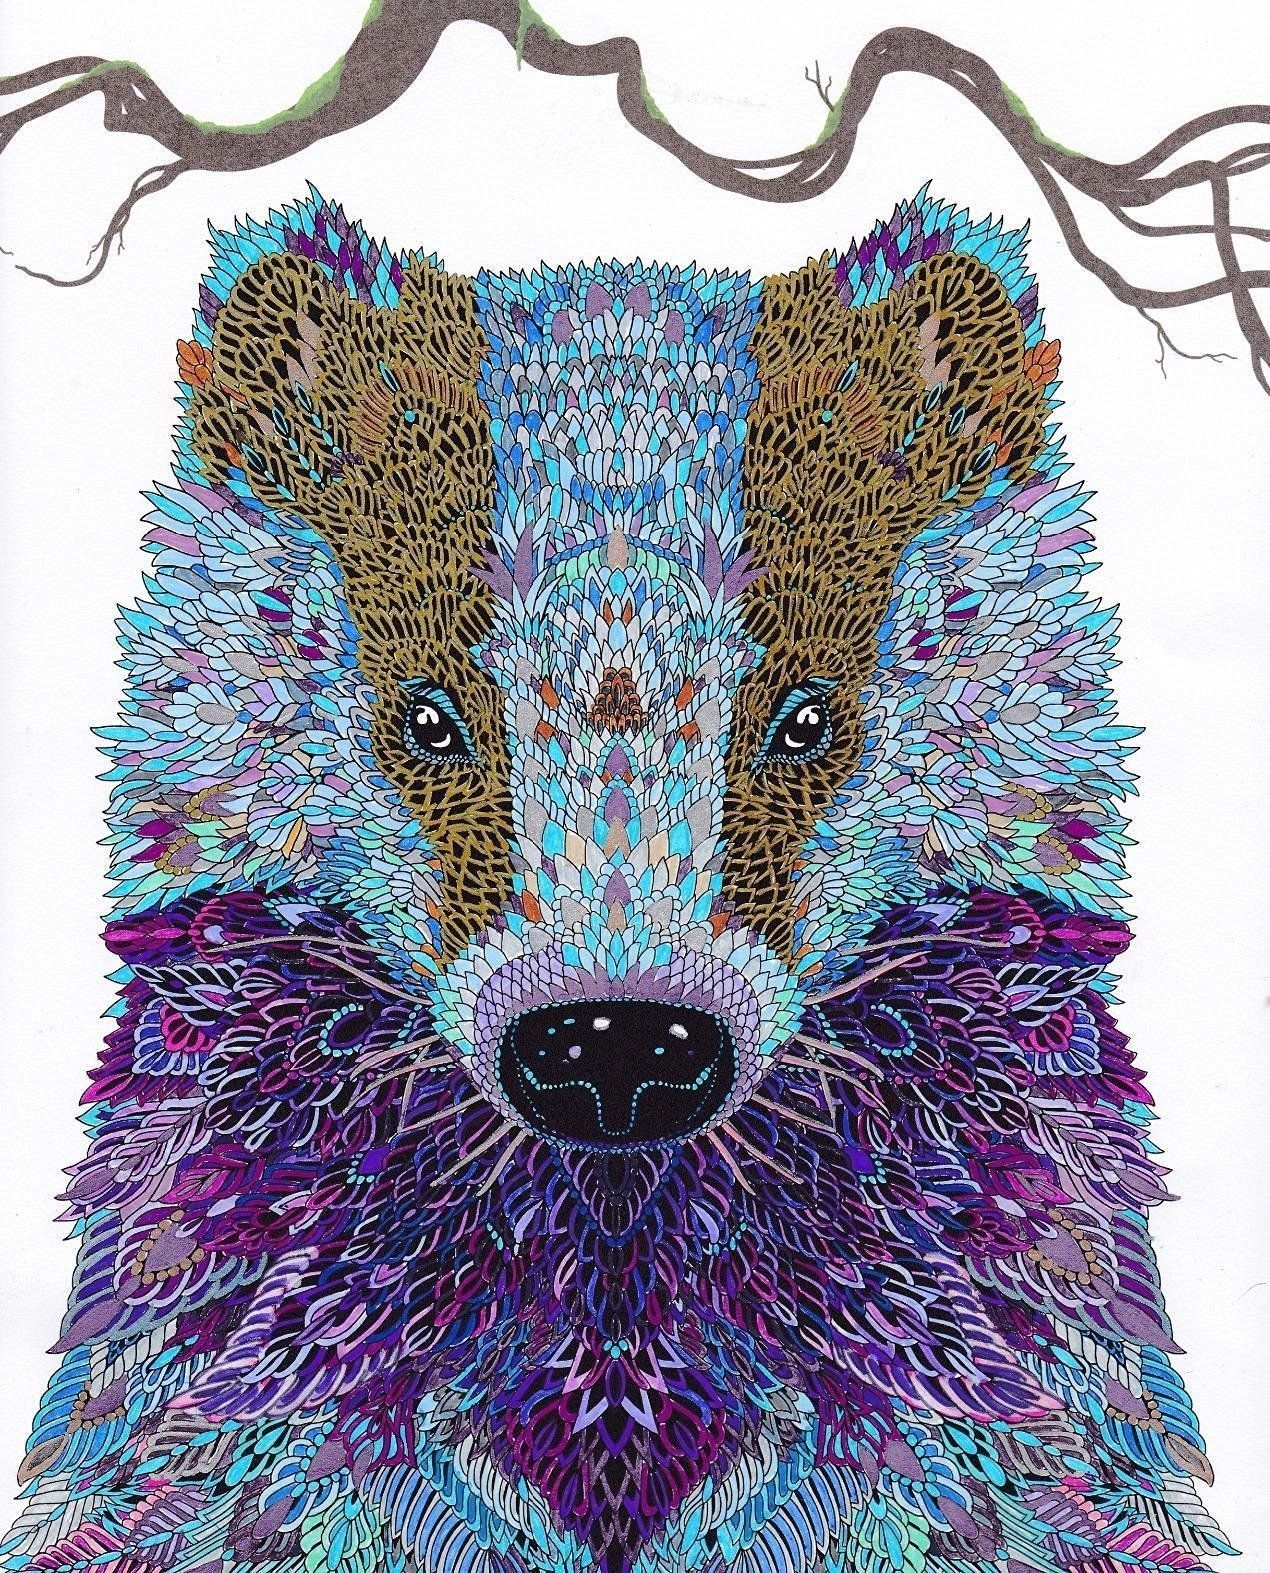 Amazon Com The Menagerie Animal Portraits To Color 9781438008509 Richard Animal Coloring Books Millie Marotta Coloring Book Pet Portraits